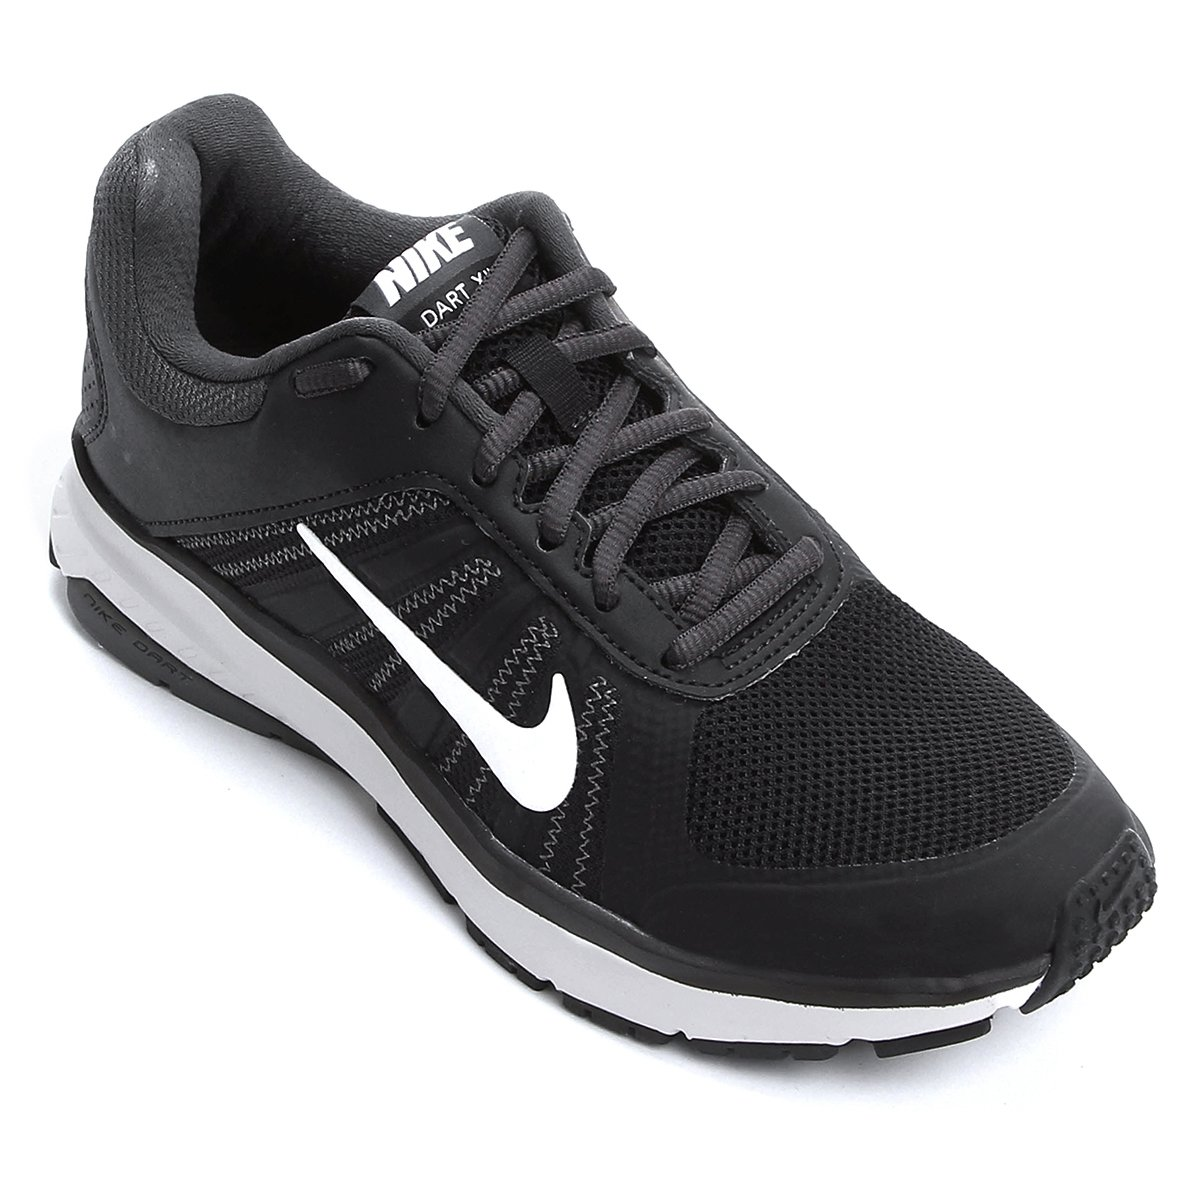 f4710d7508 Tênis Feminino Nike Wmns Dart 12 Msl 831539-001 - Black White ...